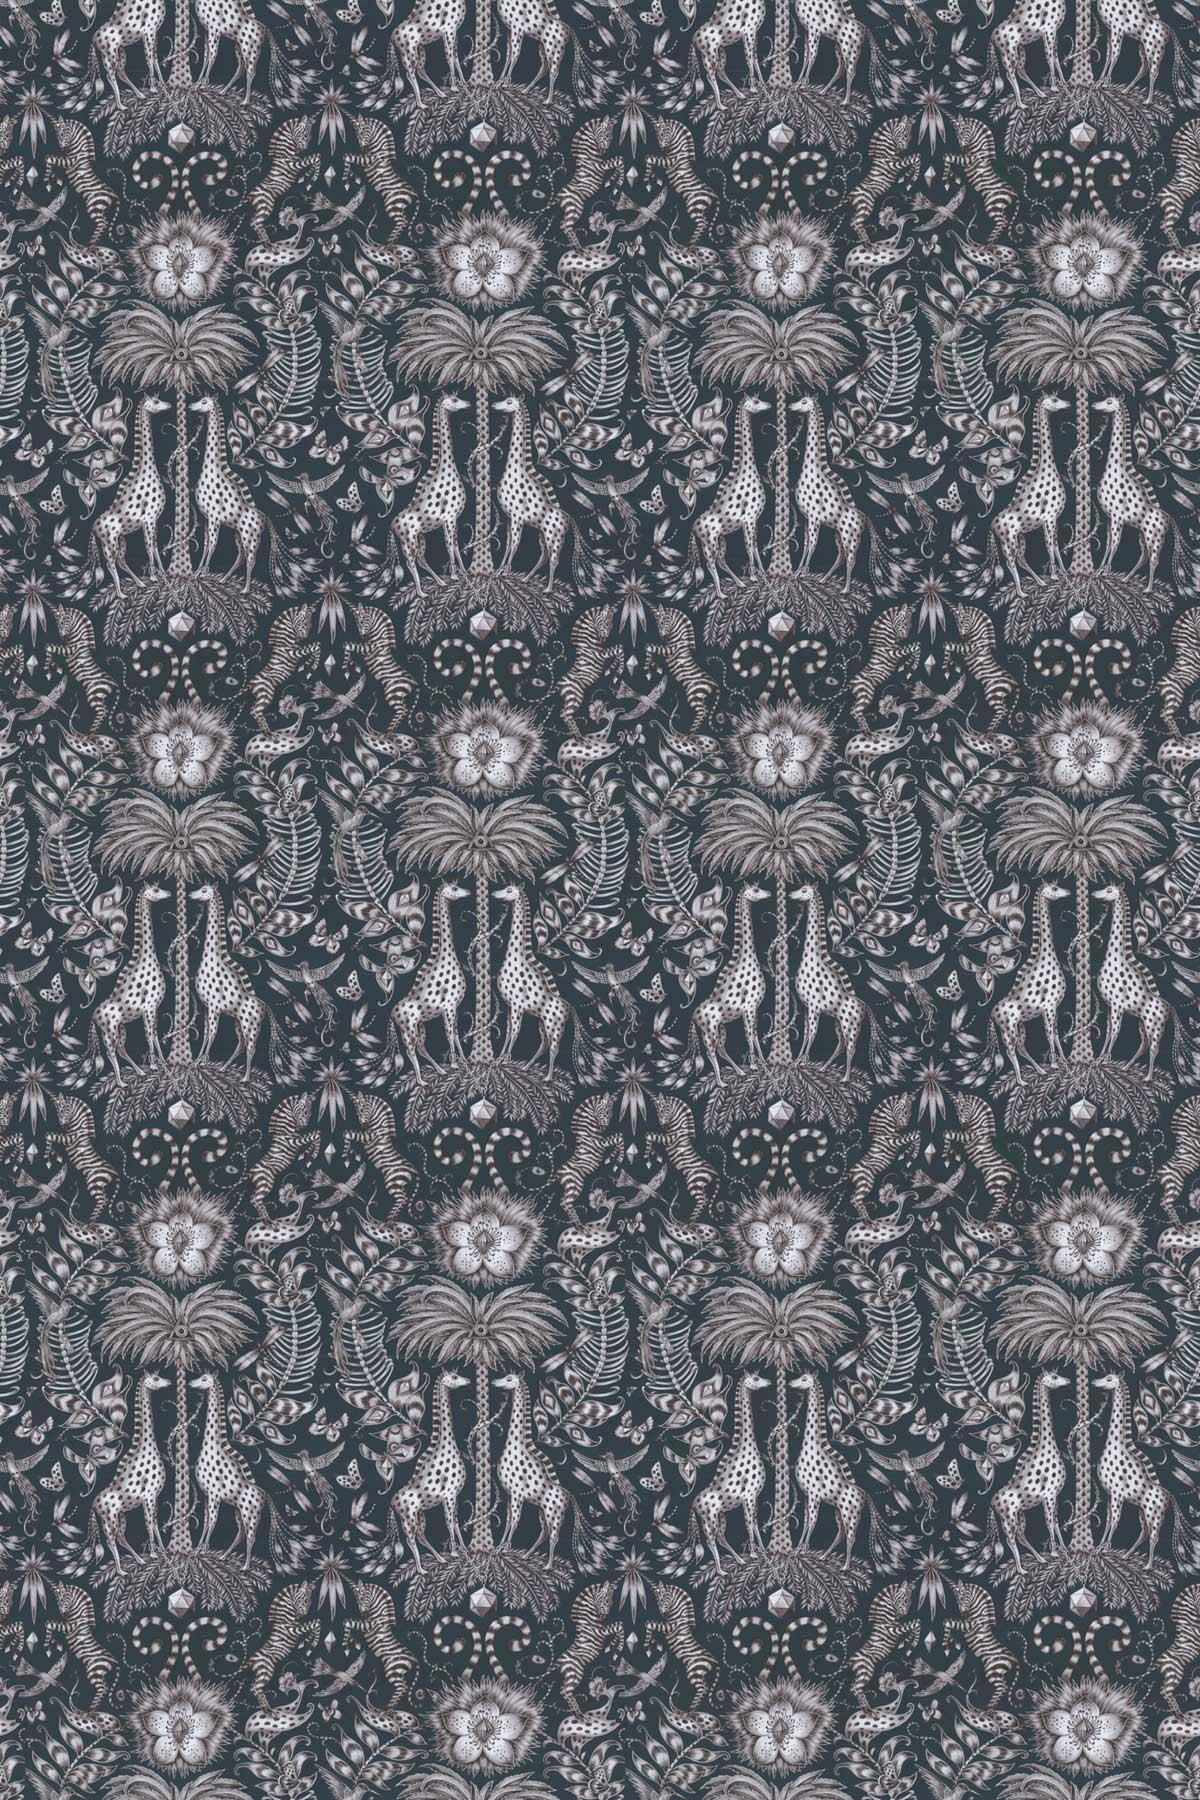 Emma J Shipley Kruger Navy Fabric - Product code: F1111/05